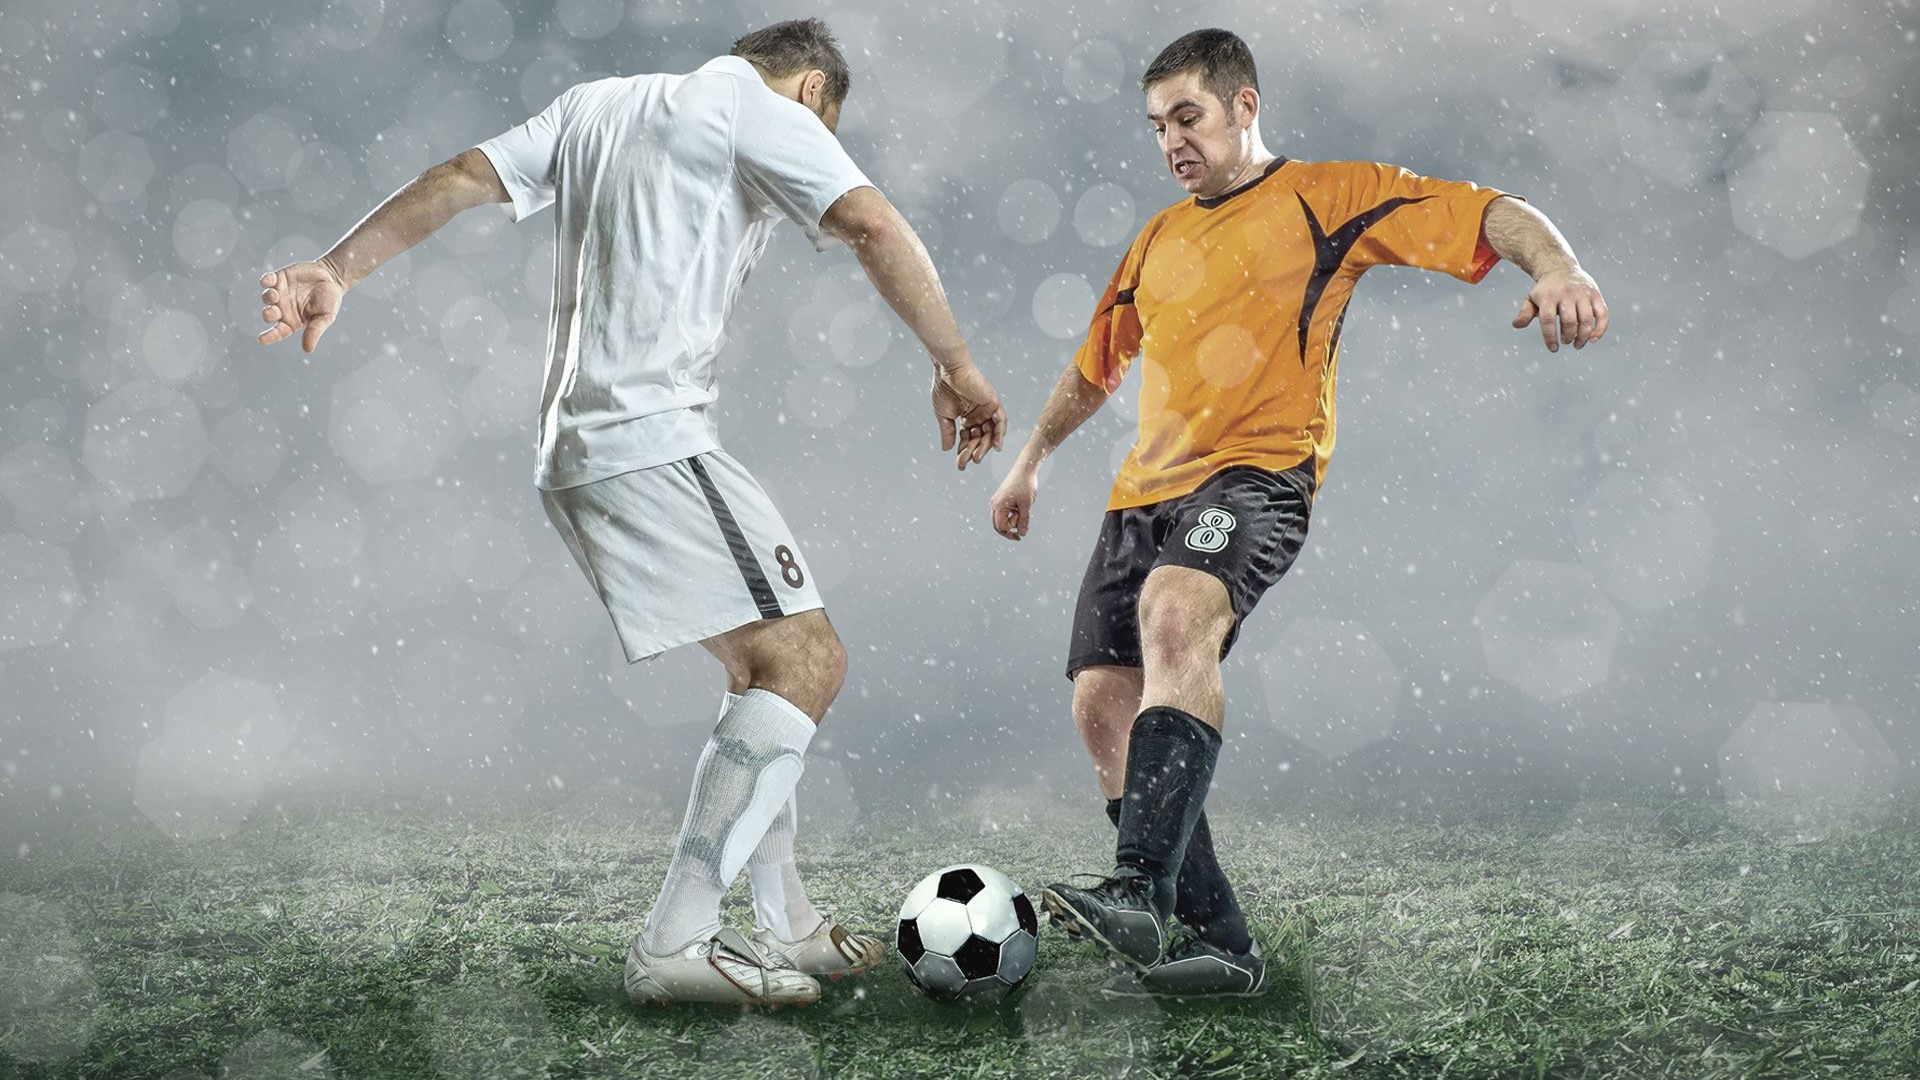 st-helens-vs-huddersfield-giants-rugby-live